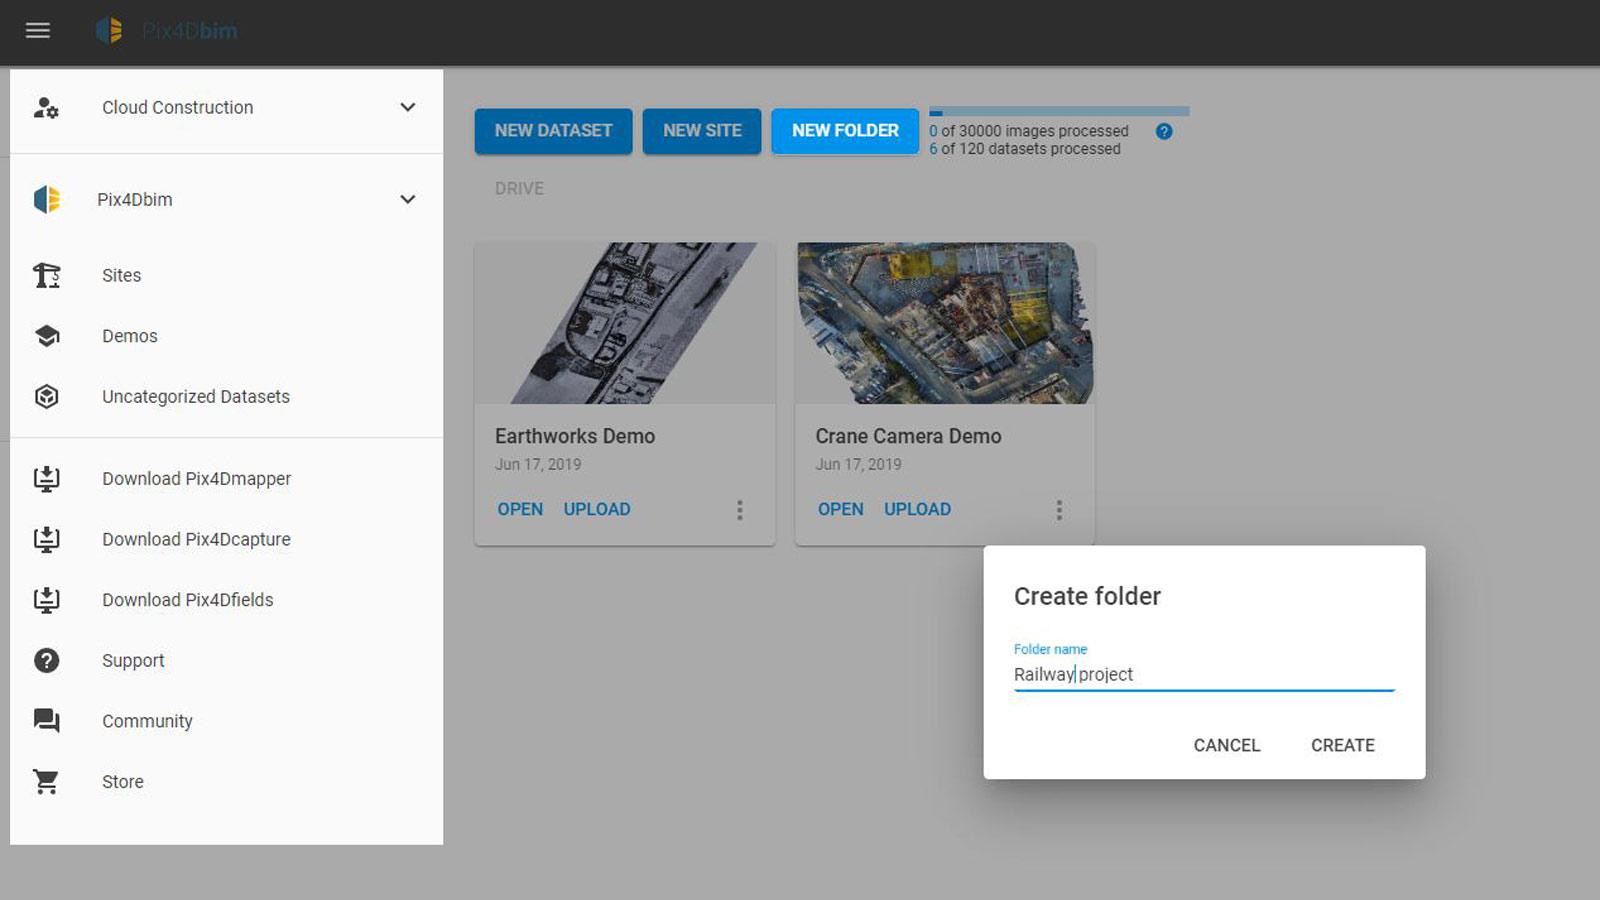 How-to-create-a-new-folder-in-Pix4Dbim